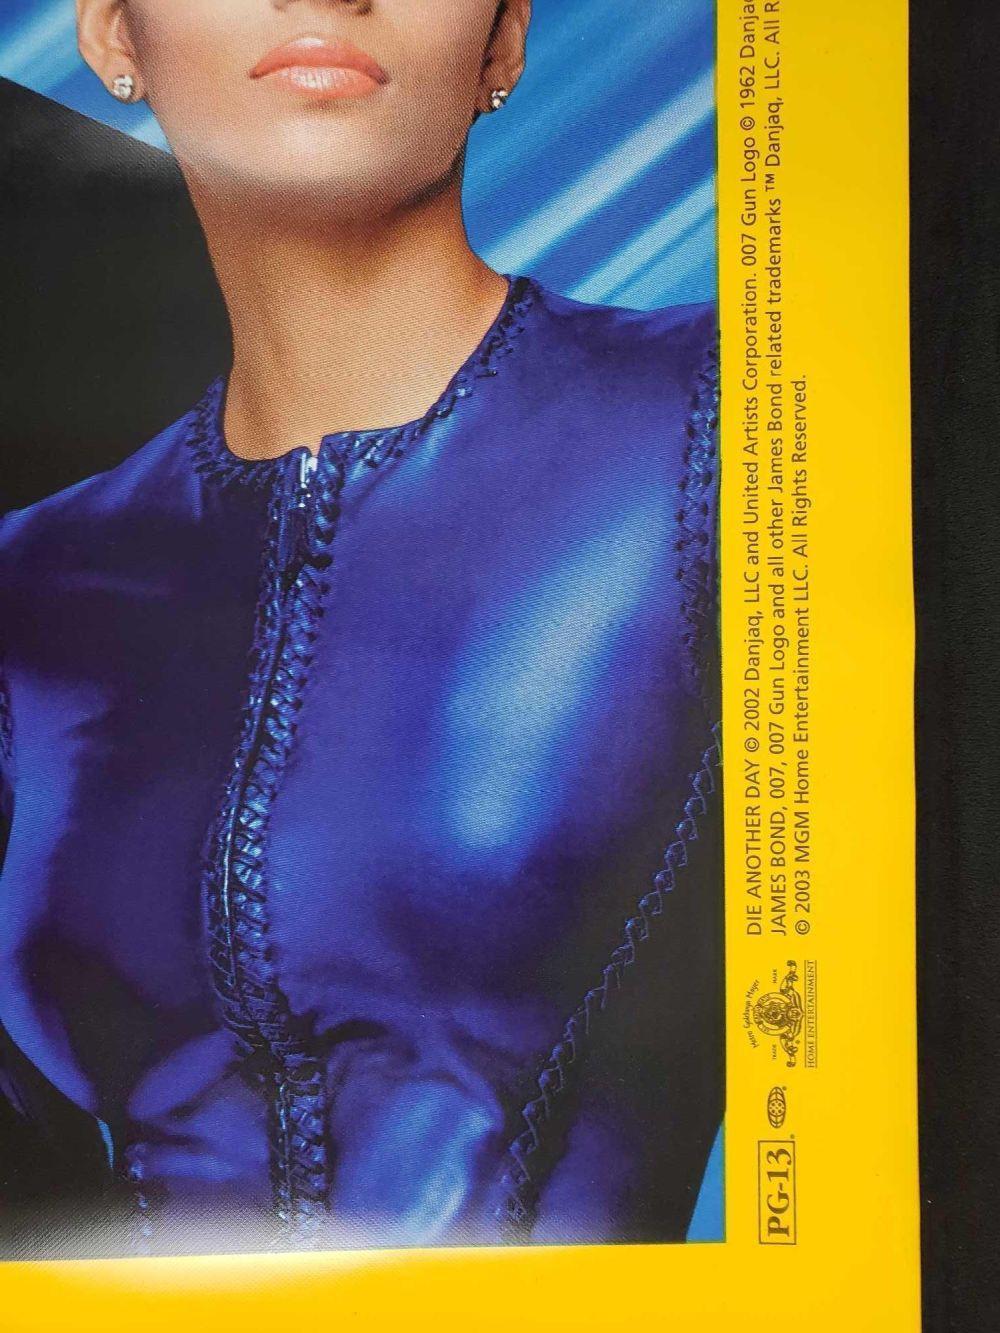 Lot 324: 007 Die Another Day Halle Berry Pierce Brosnan Vinyl Movie Poster